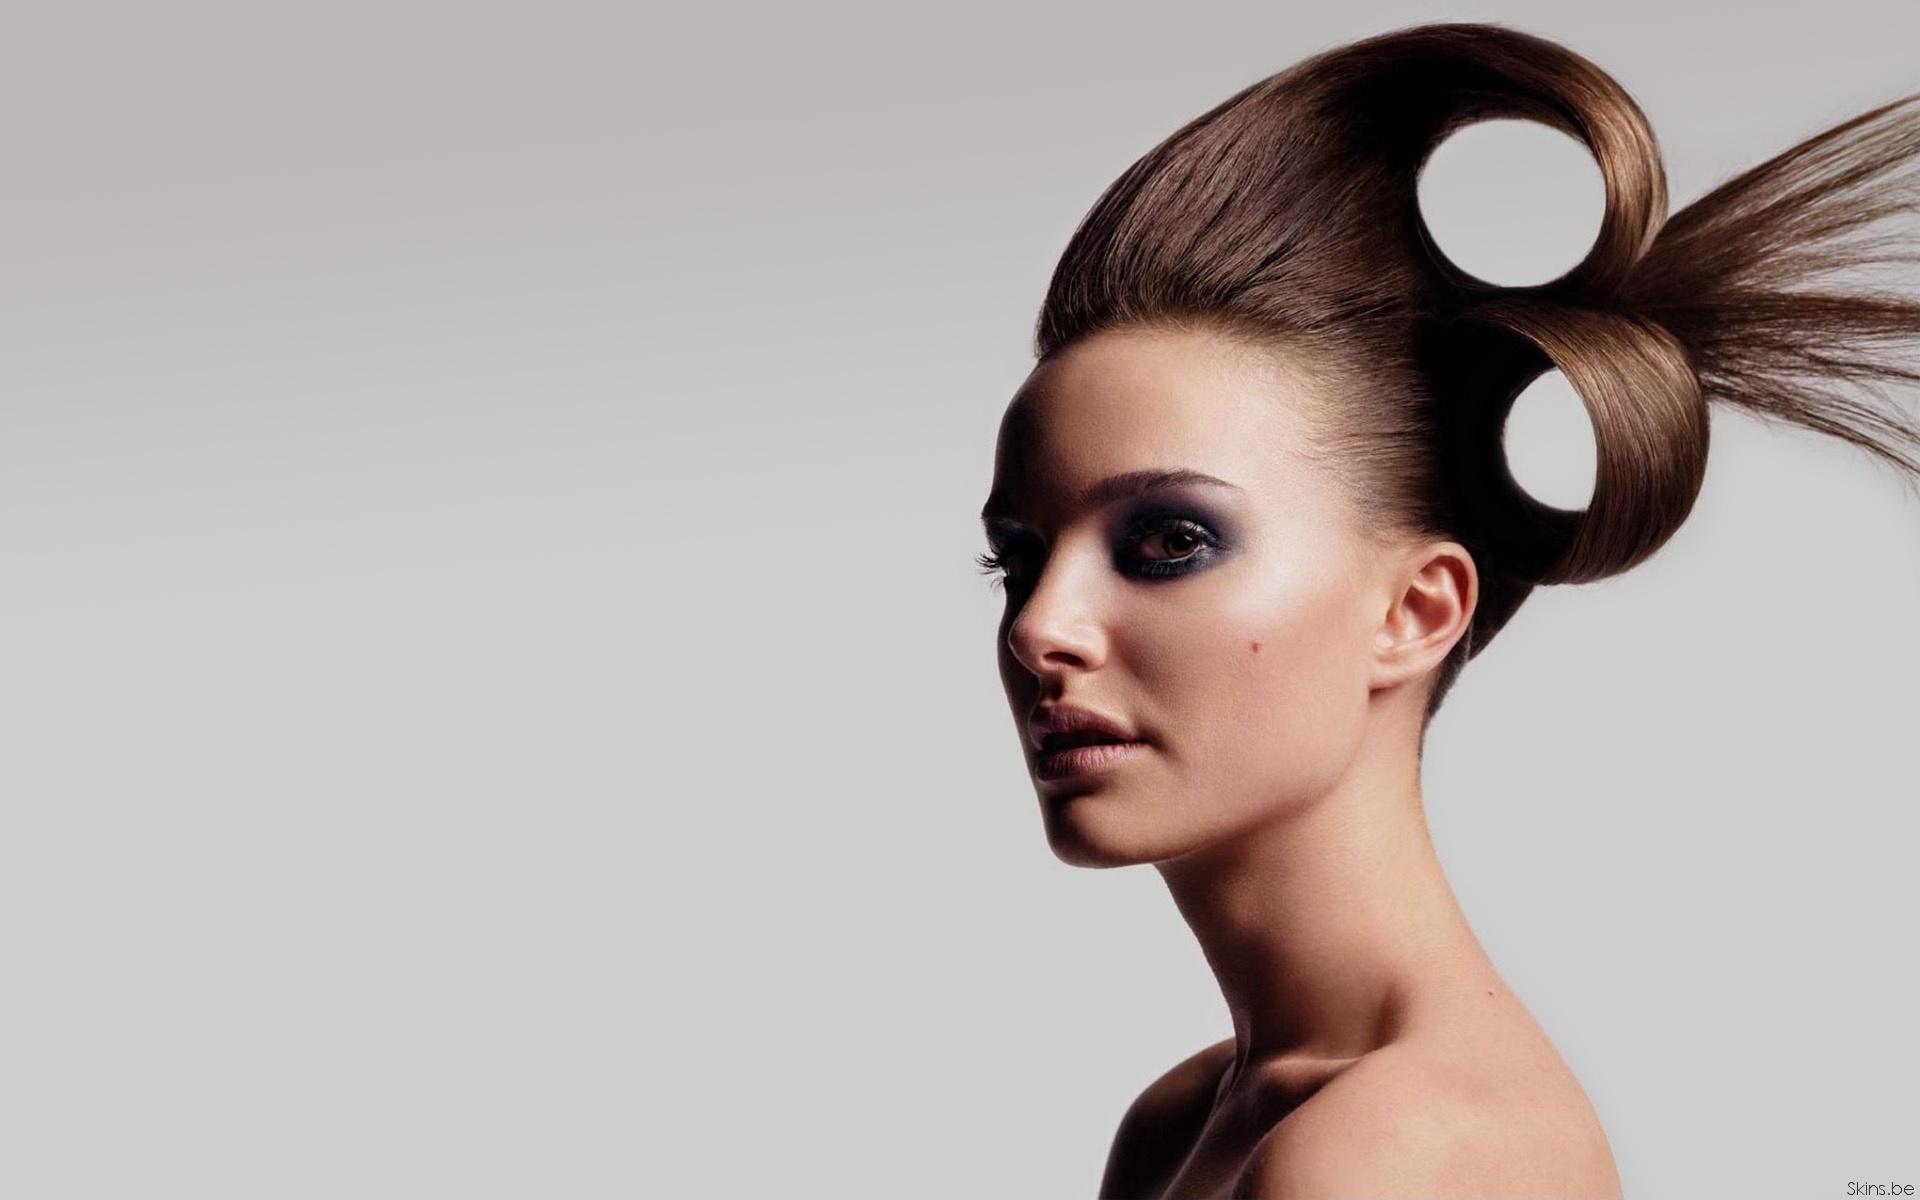 Фото моделей с причёсками